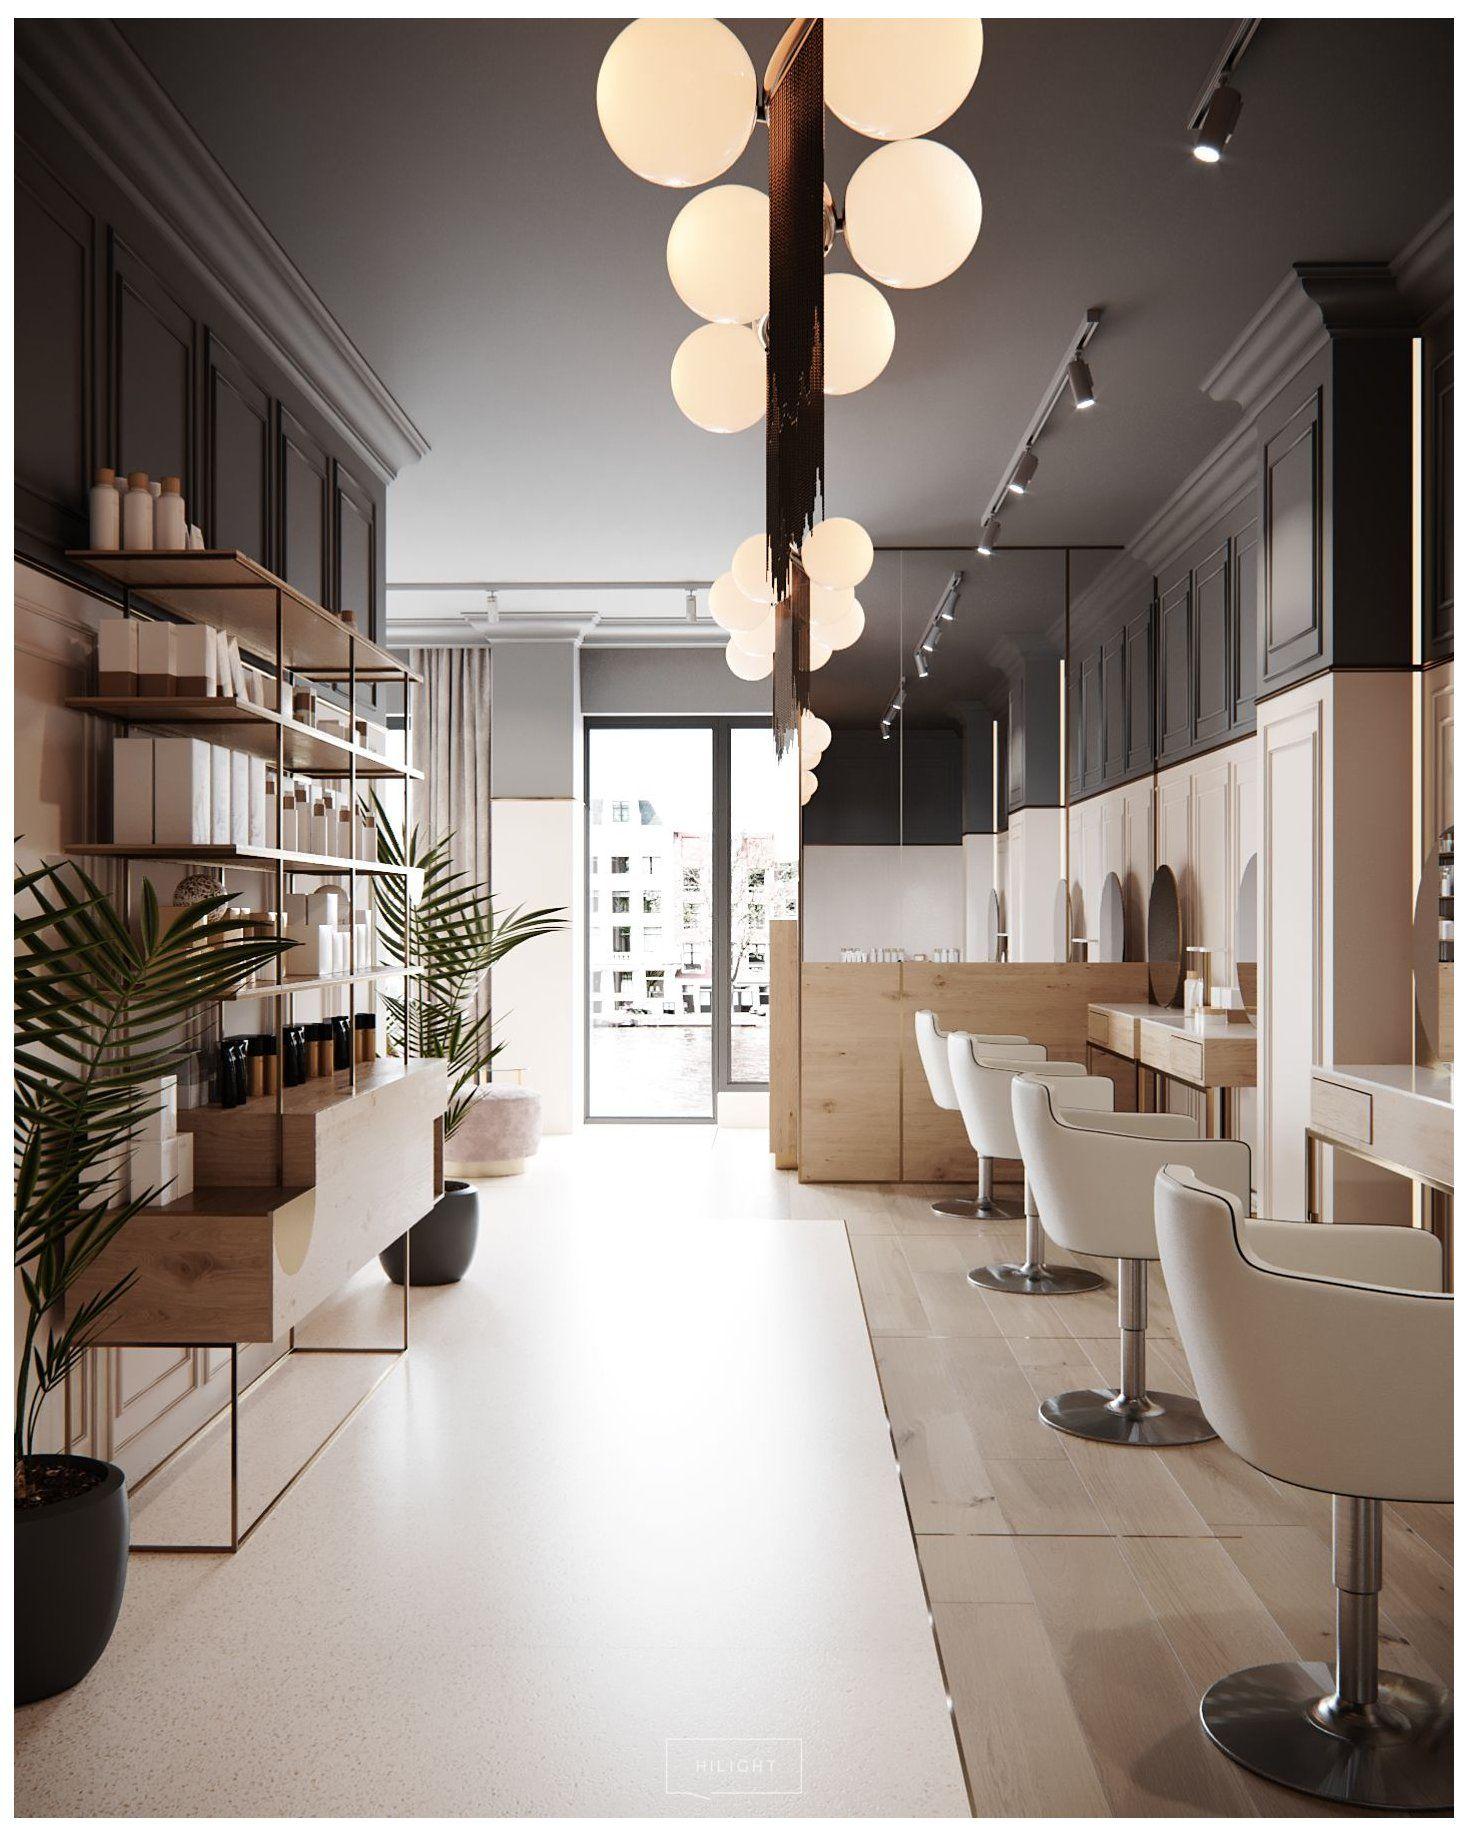 Pin On Nails And Hair Studio